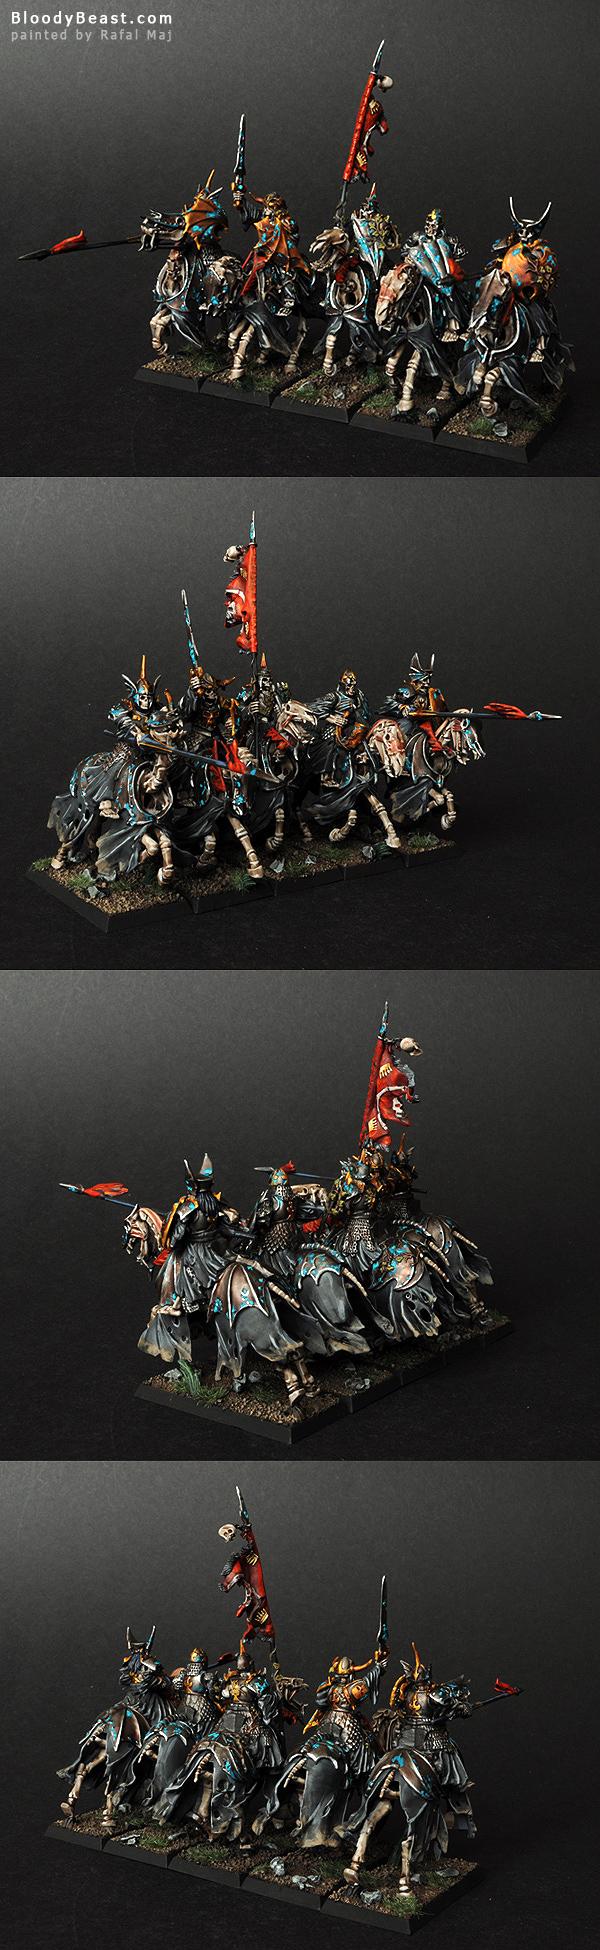 Vampire Counts Black Knights painted by Rafal Maj (BloodyBeast.com)